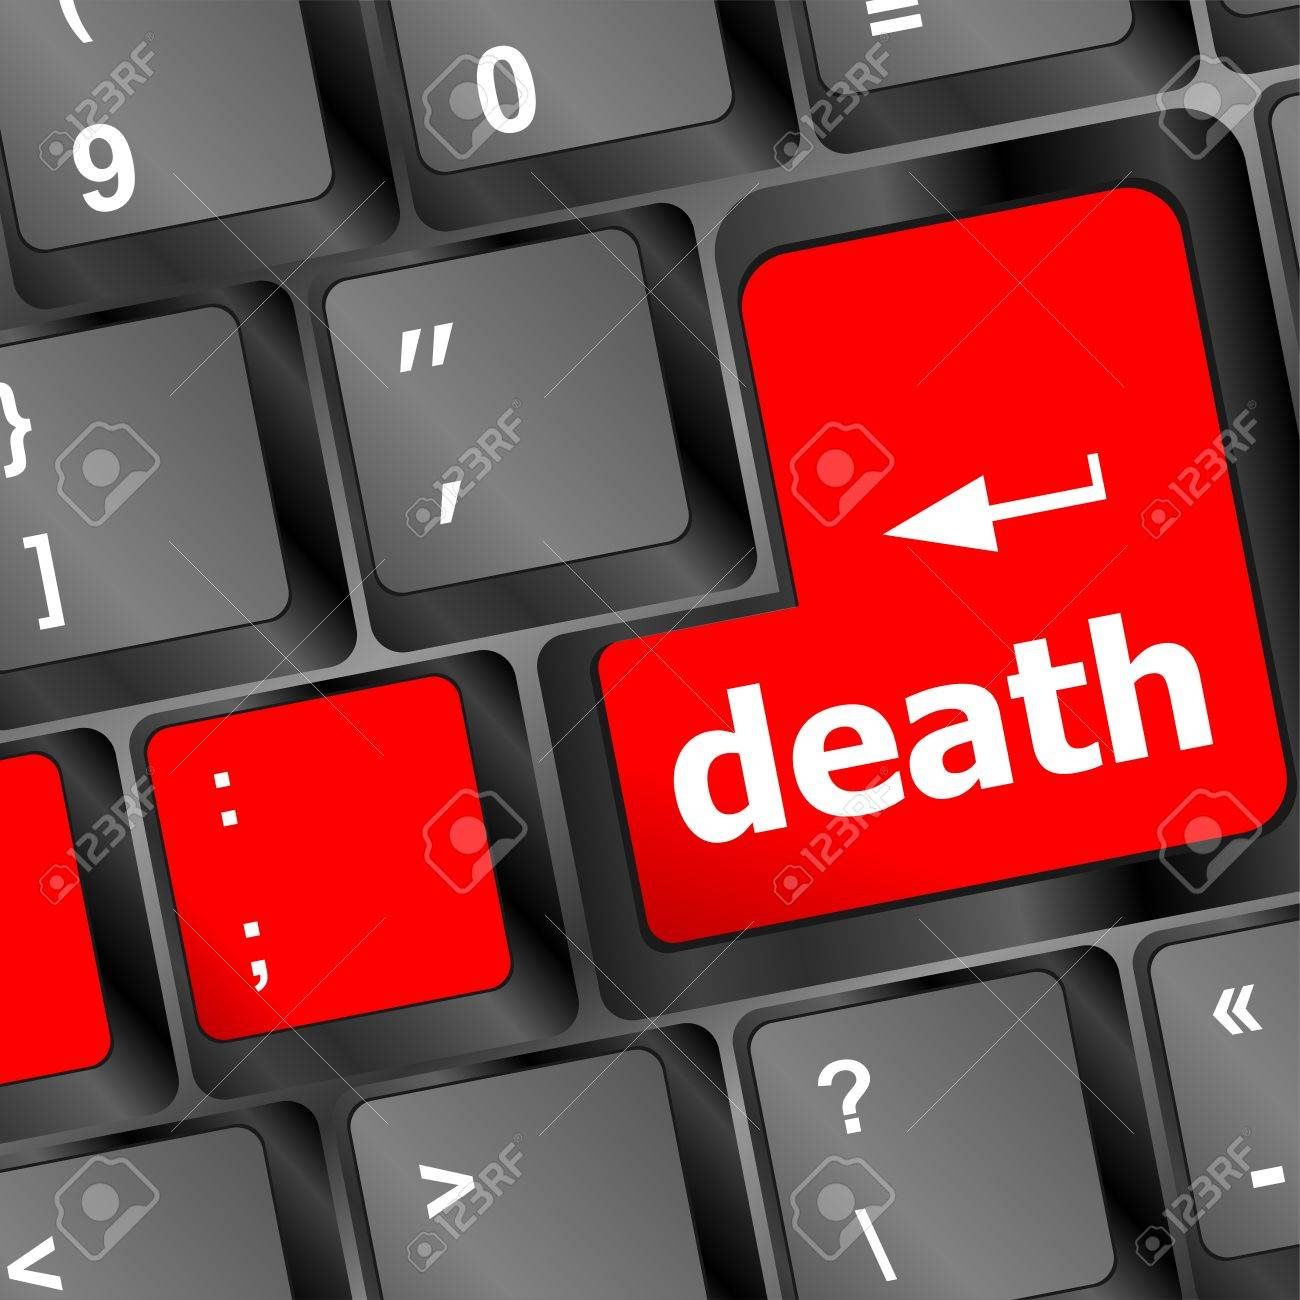 death button on computer